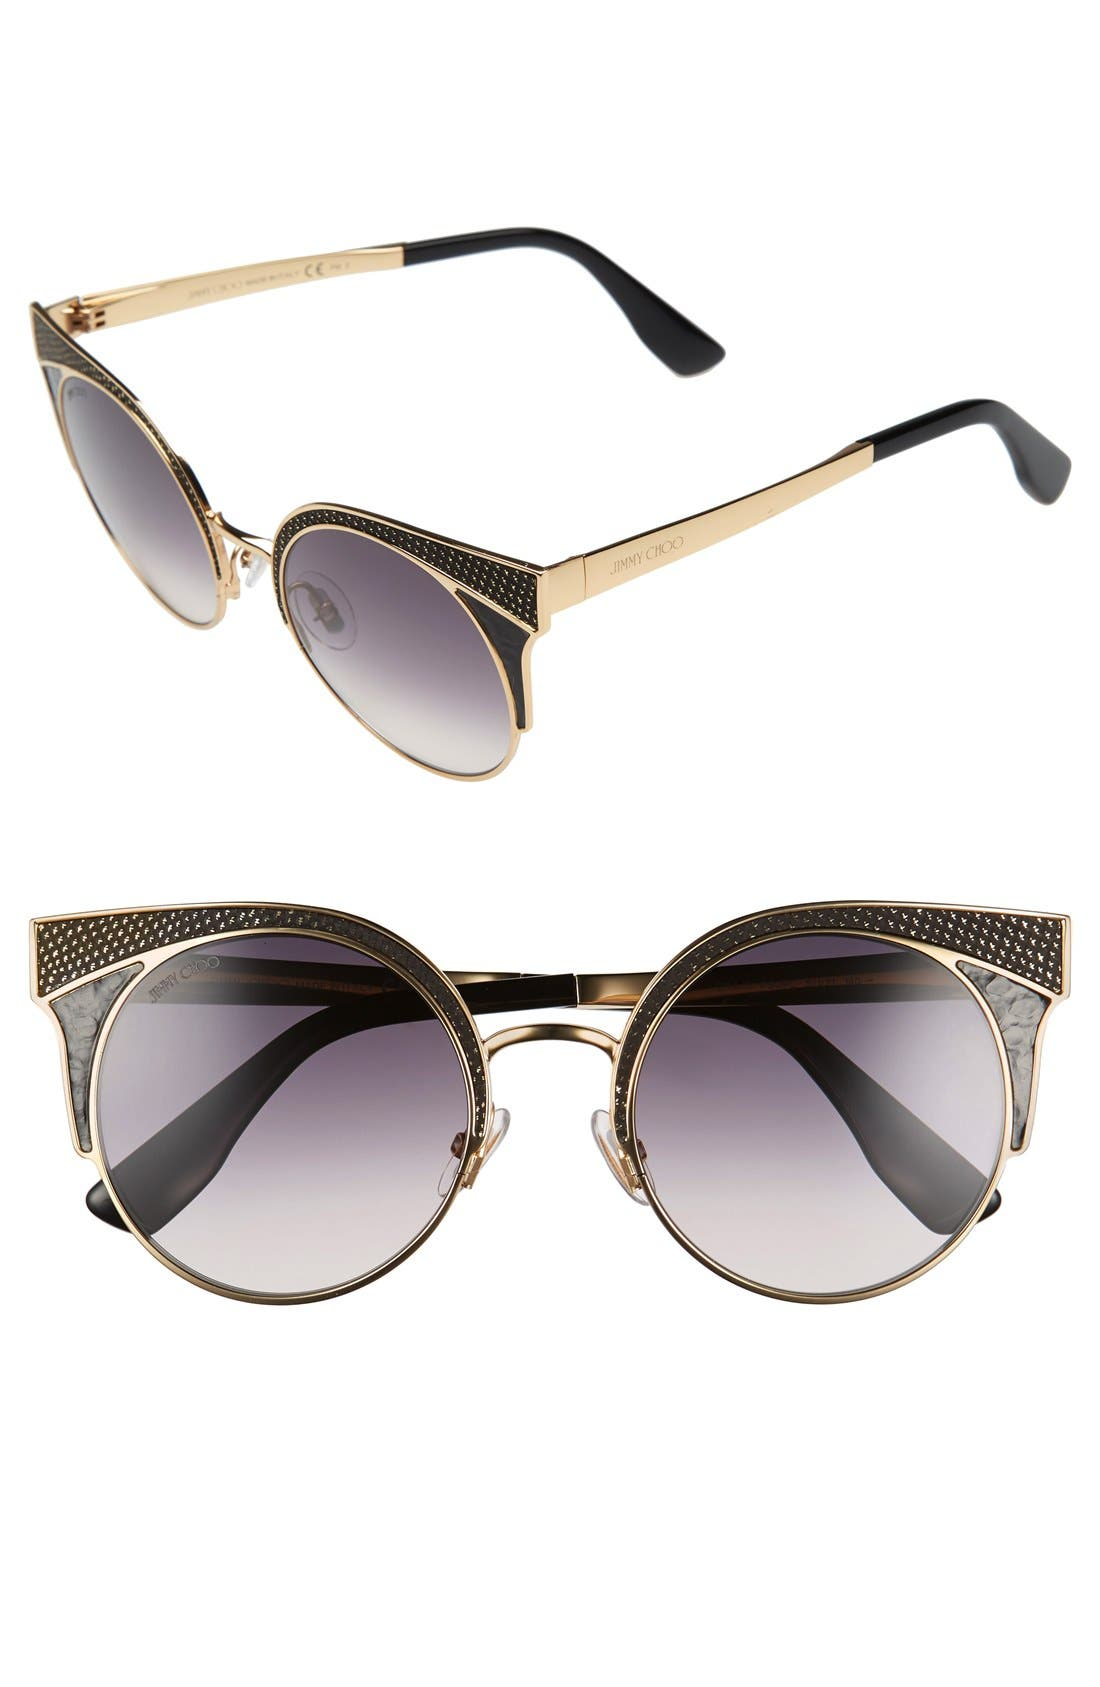 Main Image - Jimmy Choo 'Ora' 51mm Cat Eye Sunglasses